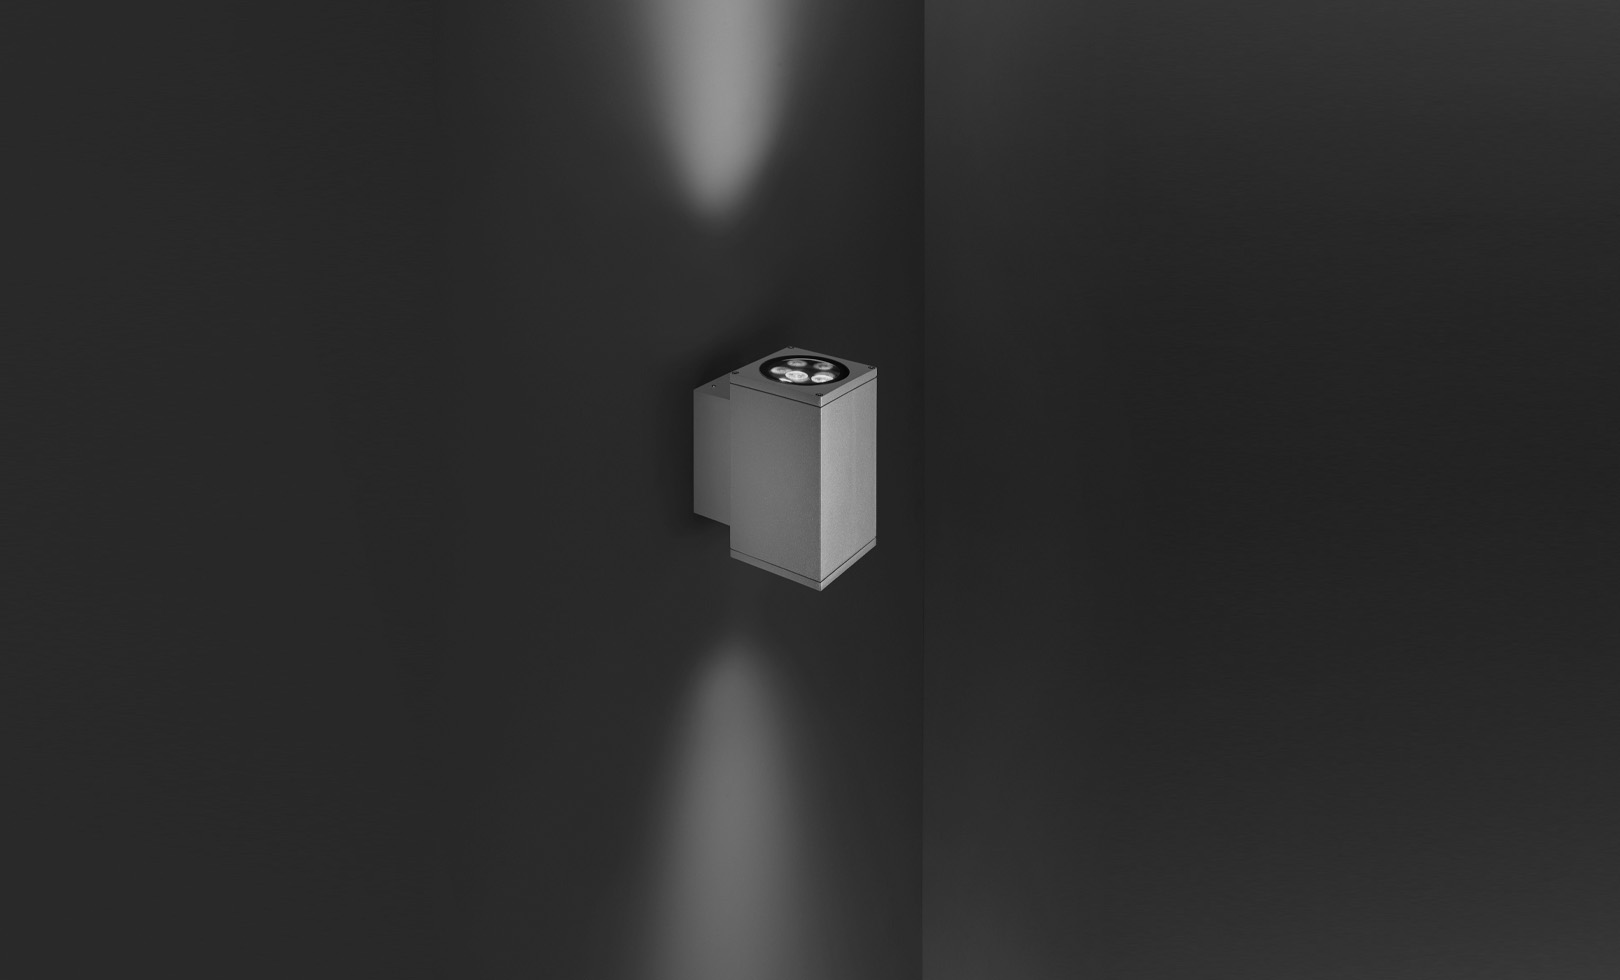 401006 TECH MEDIUM 02 SQUARE LED 2x8W 1